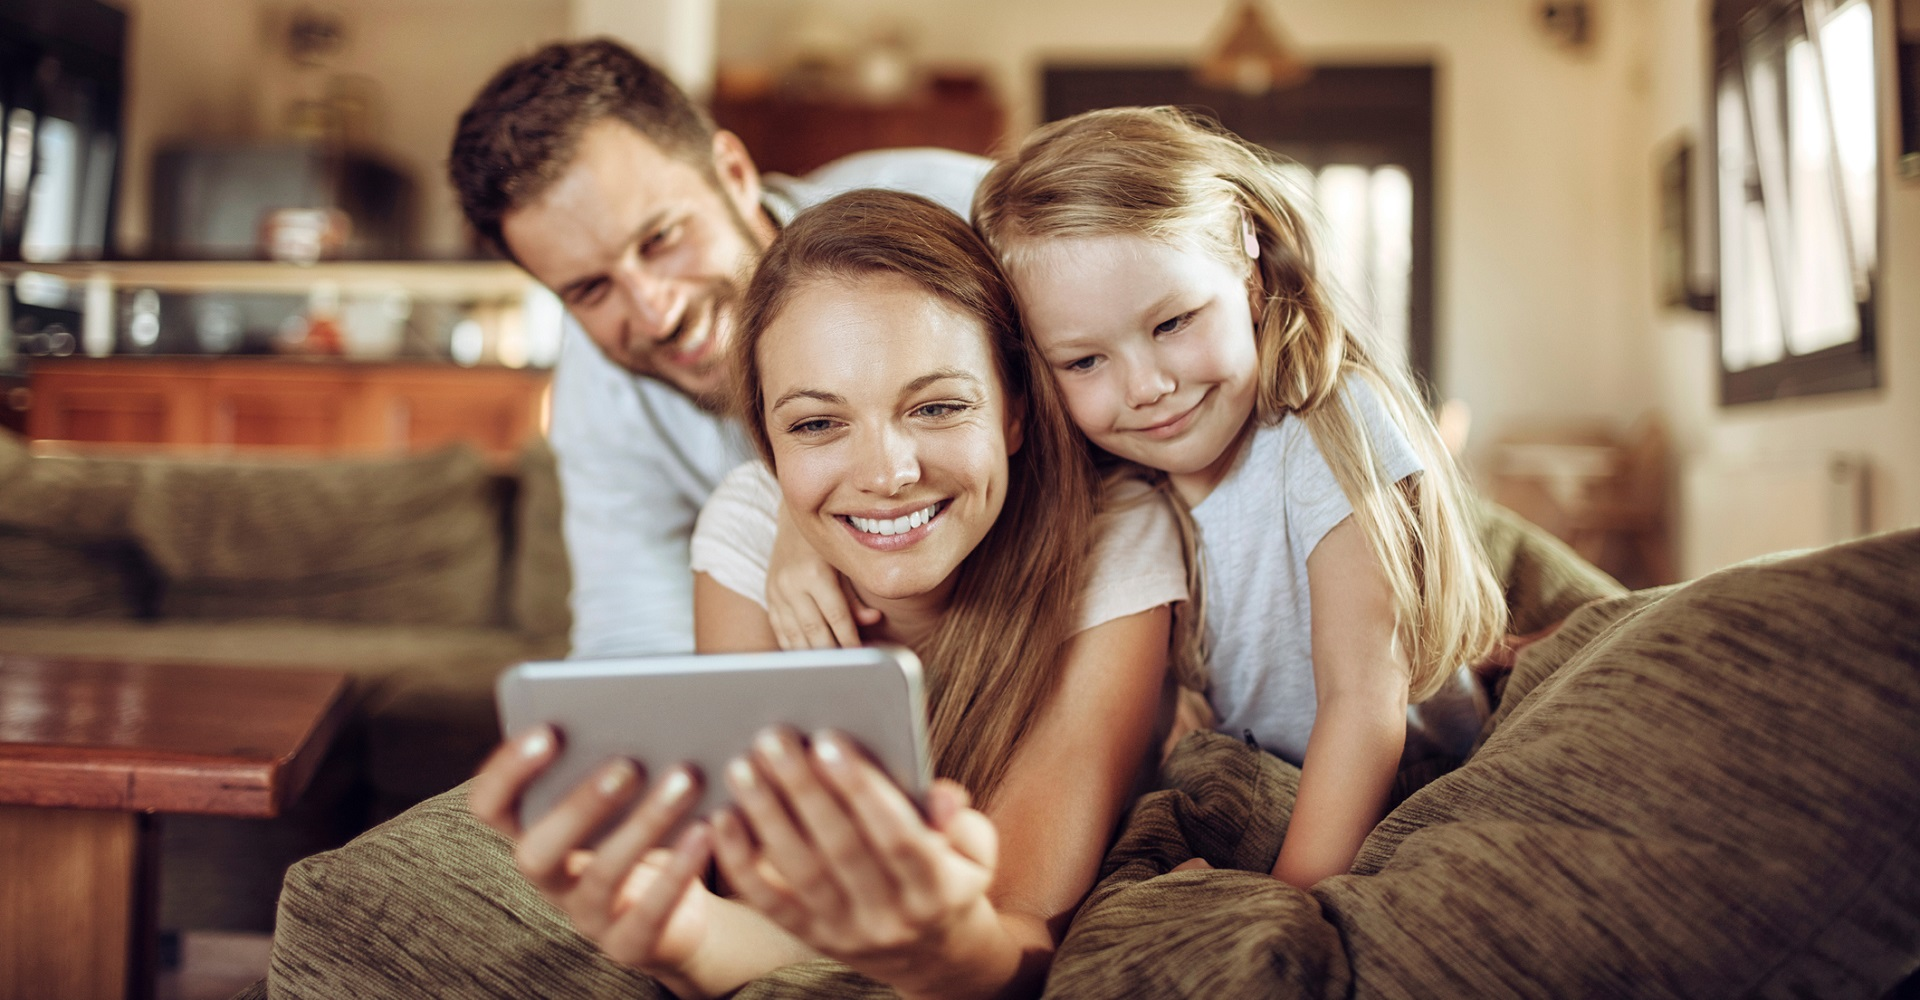 Familie schaut sich Fotos auf dem iPhone an